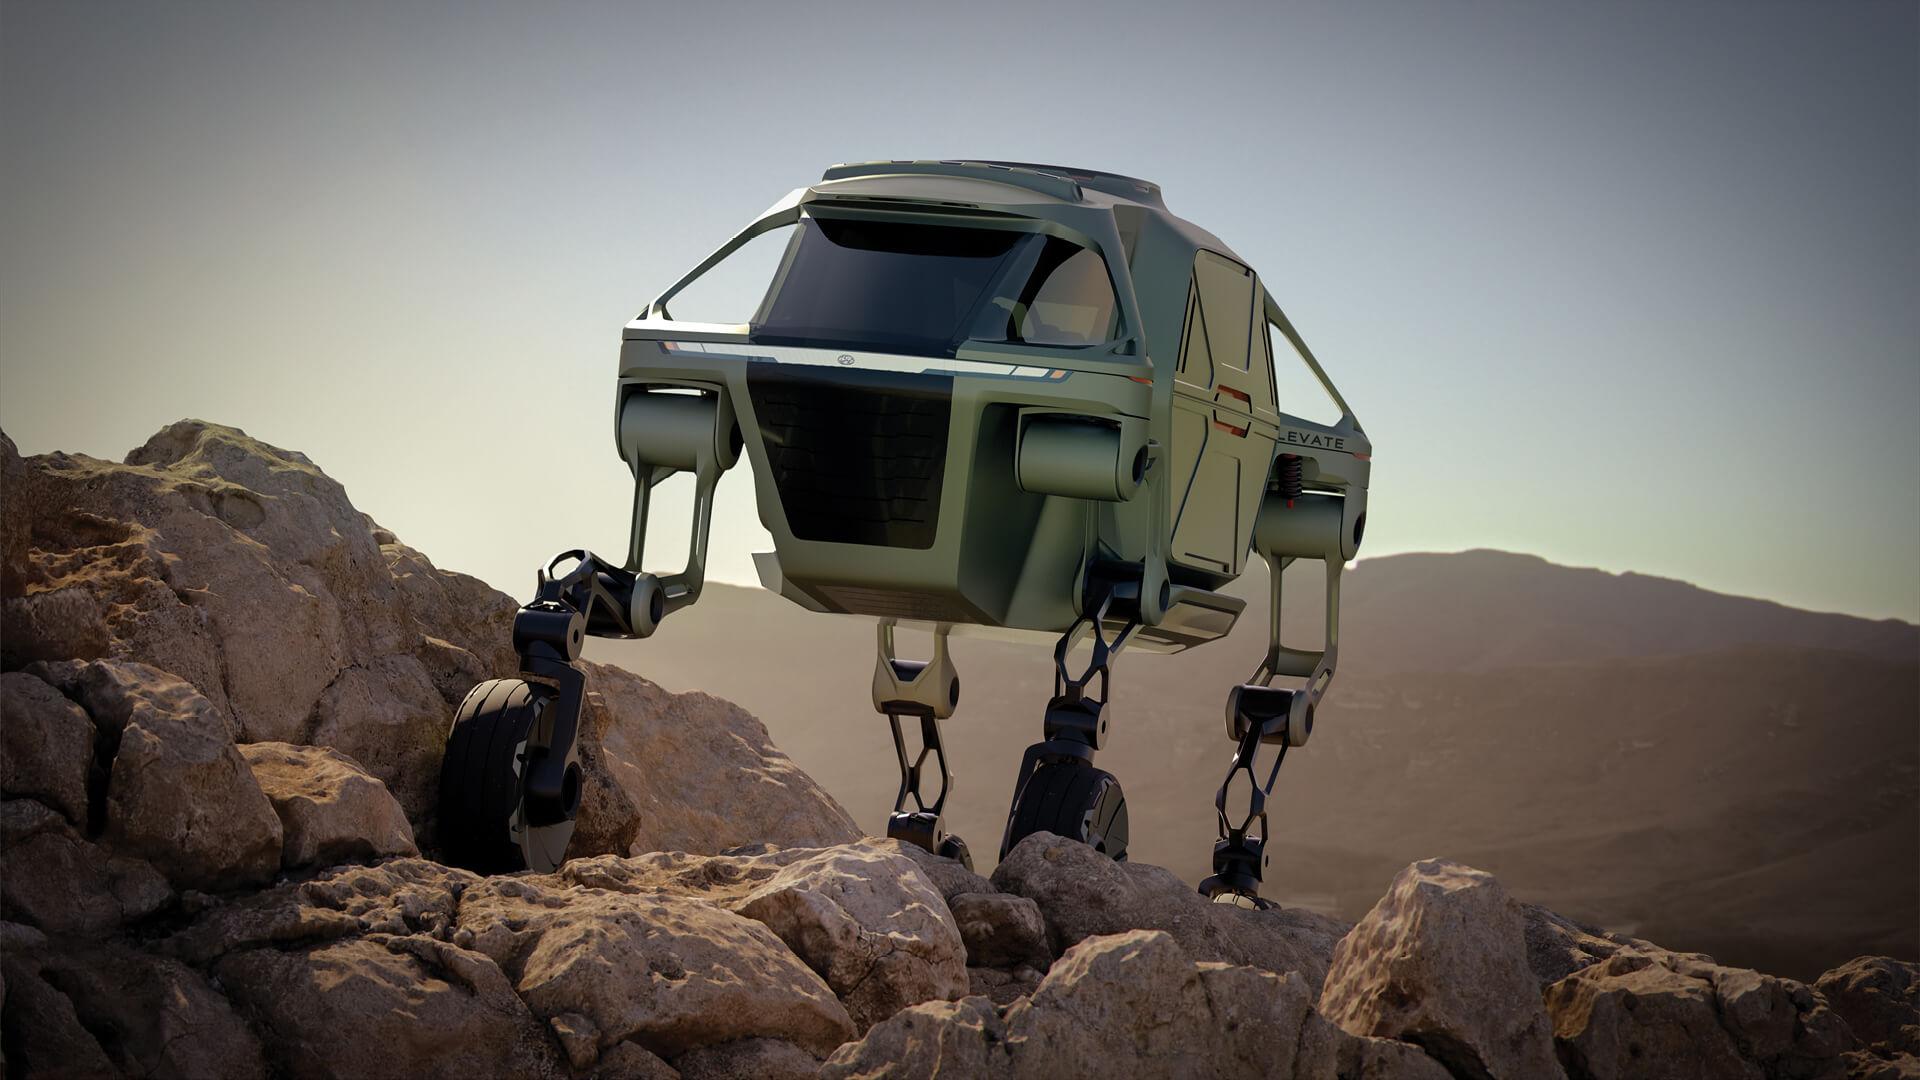 The Hyundai Elevate concept UMV | New Horizons Studios by Hyundai Motor Group | STIRworld